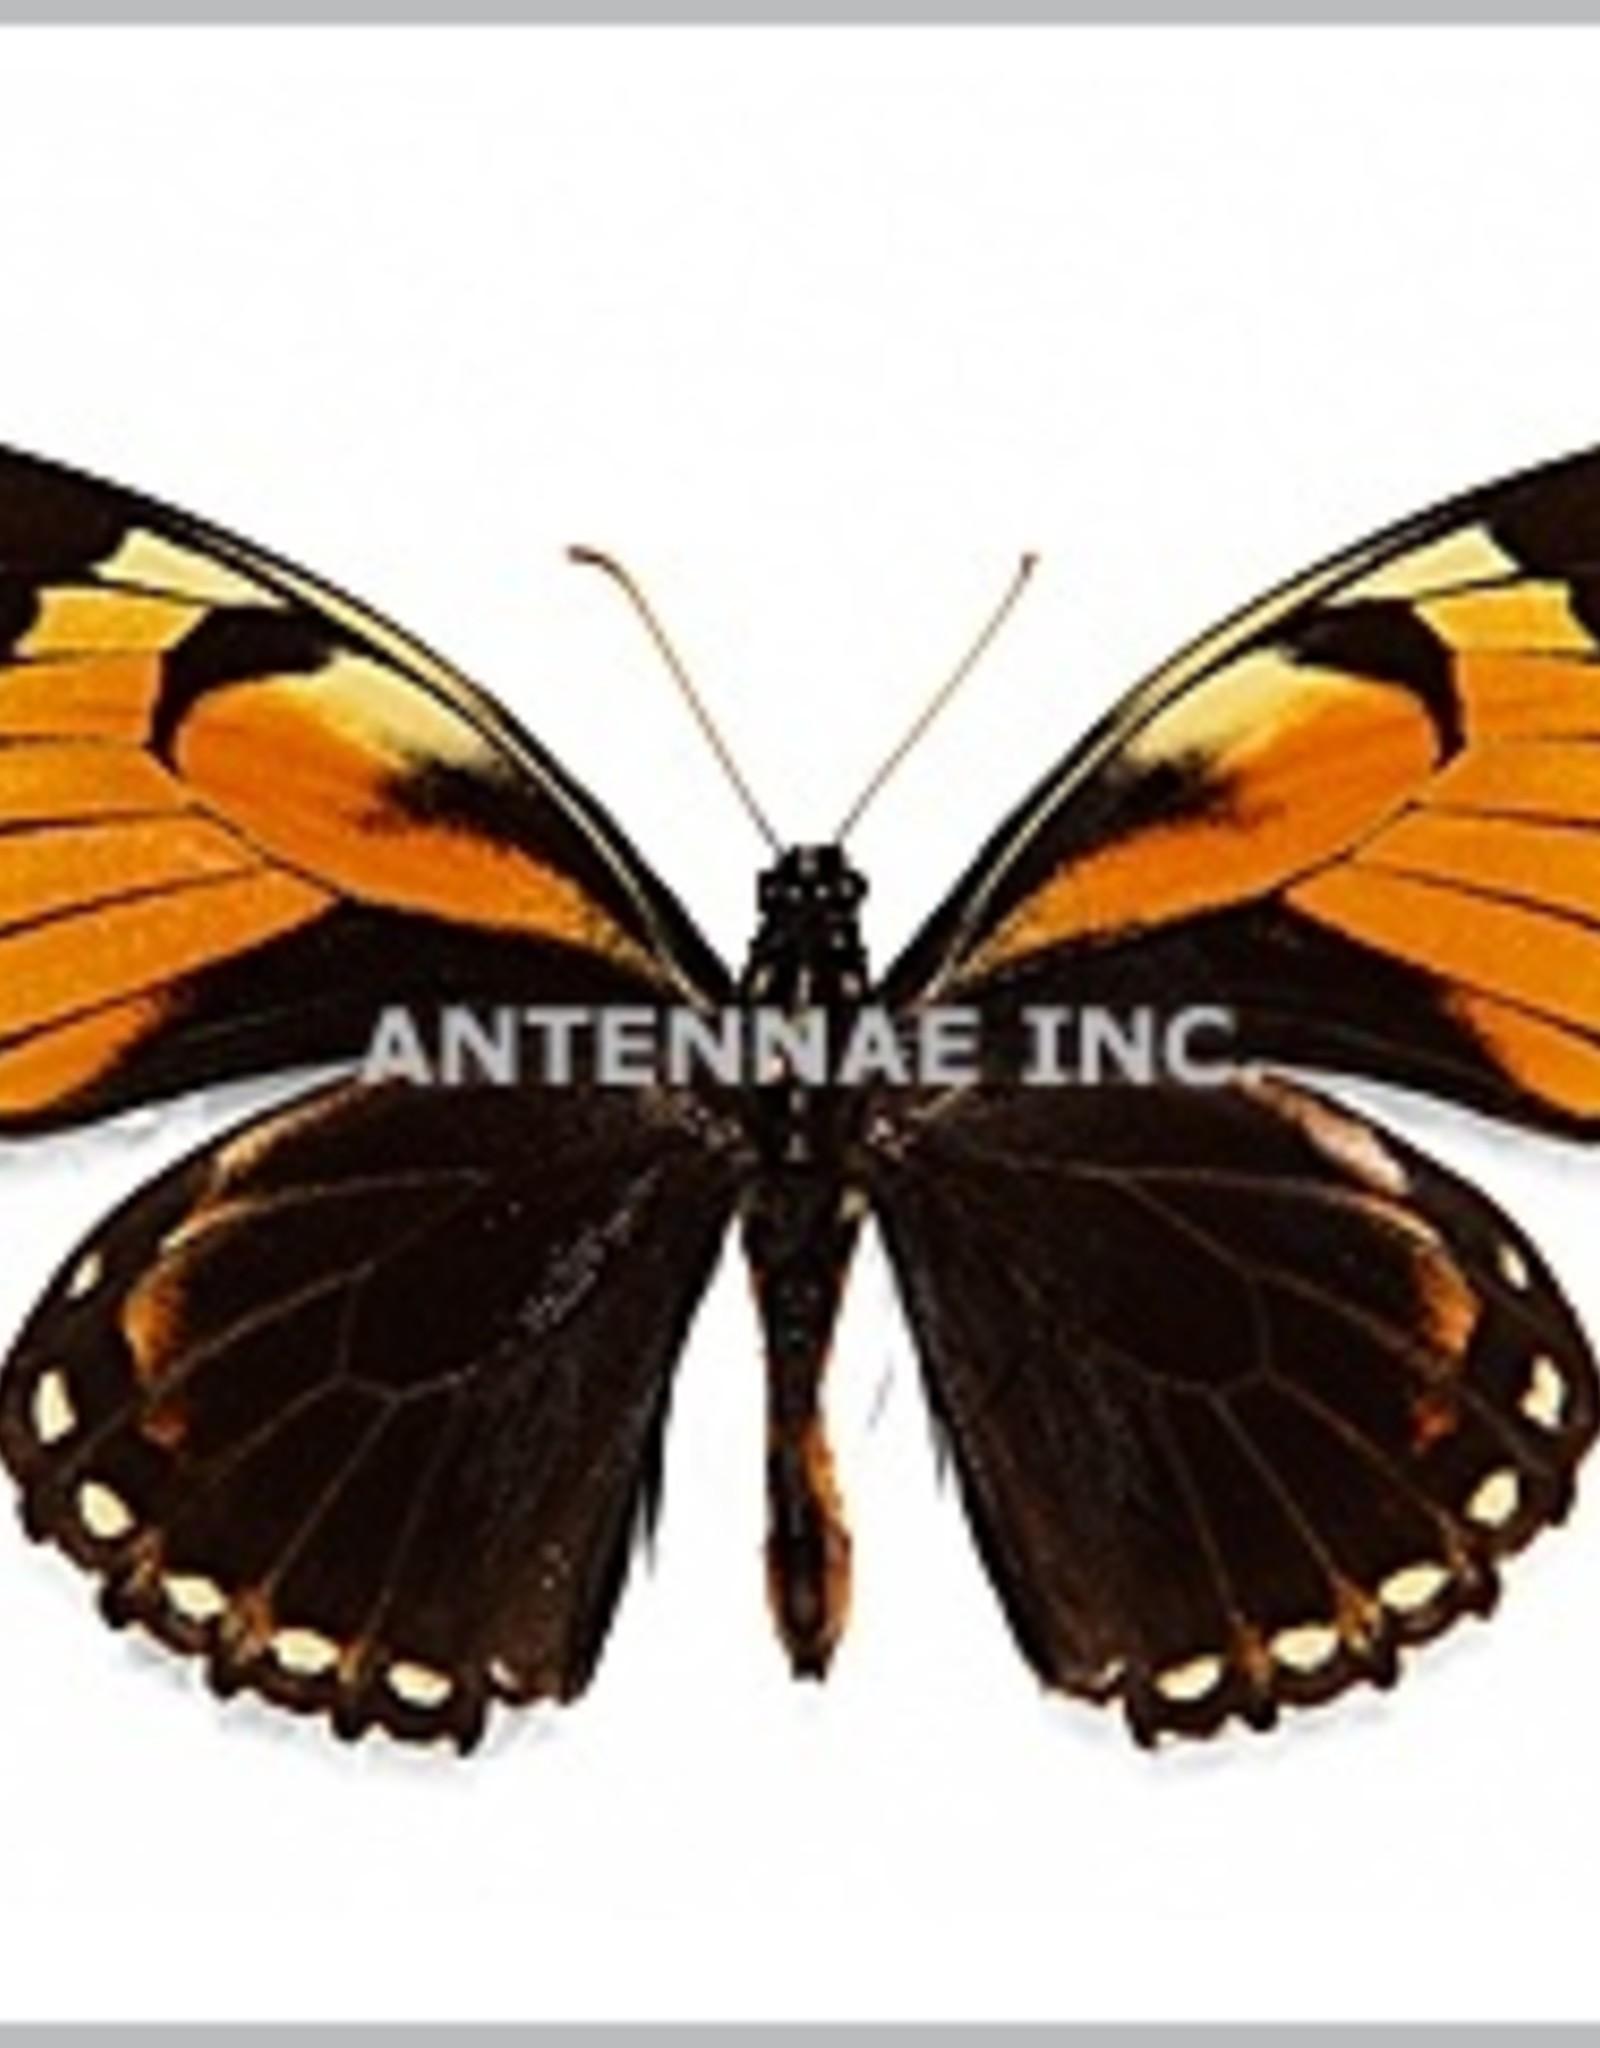 Papilio bachus chrysomelas M A1 Peru